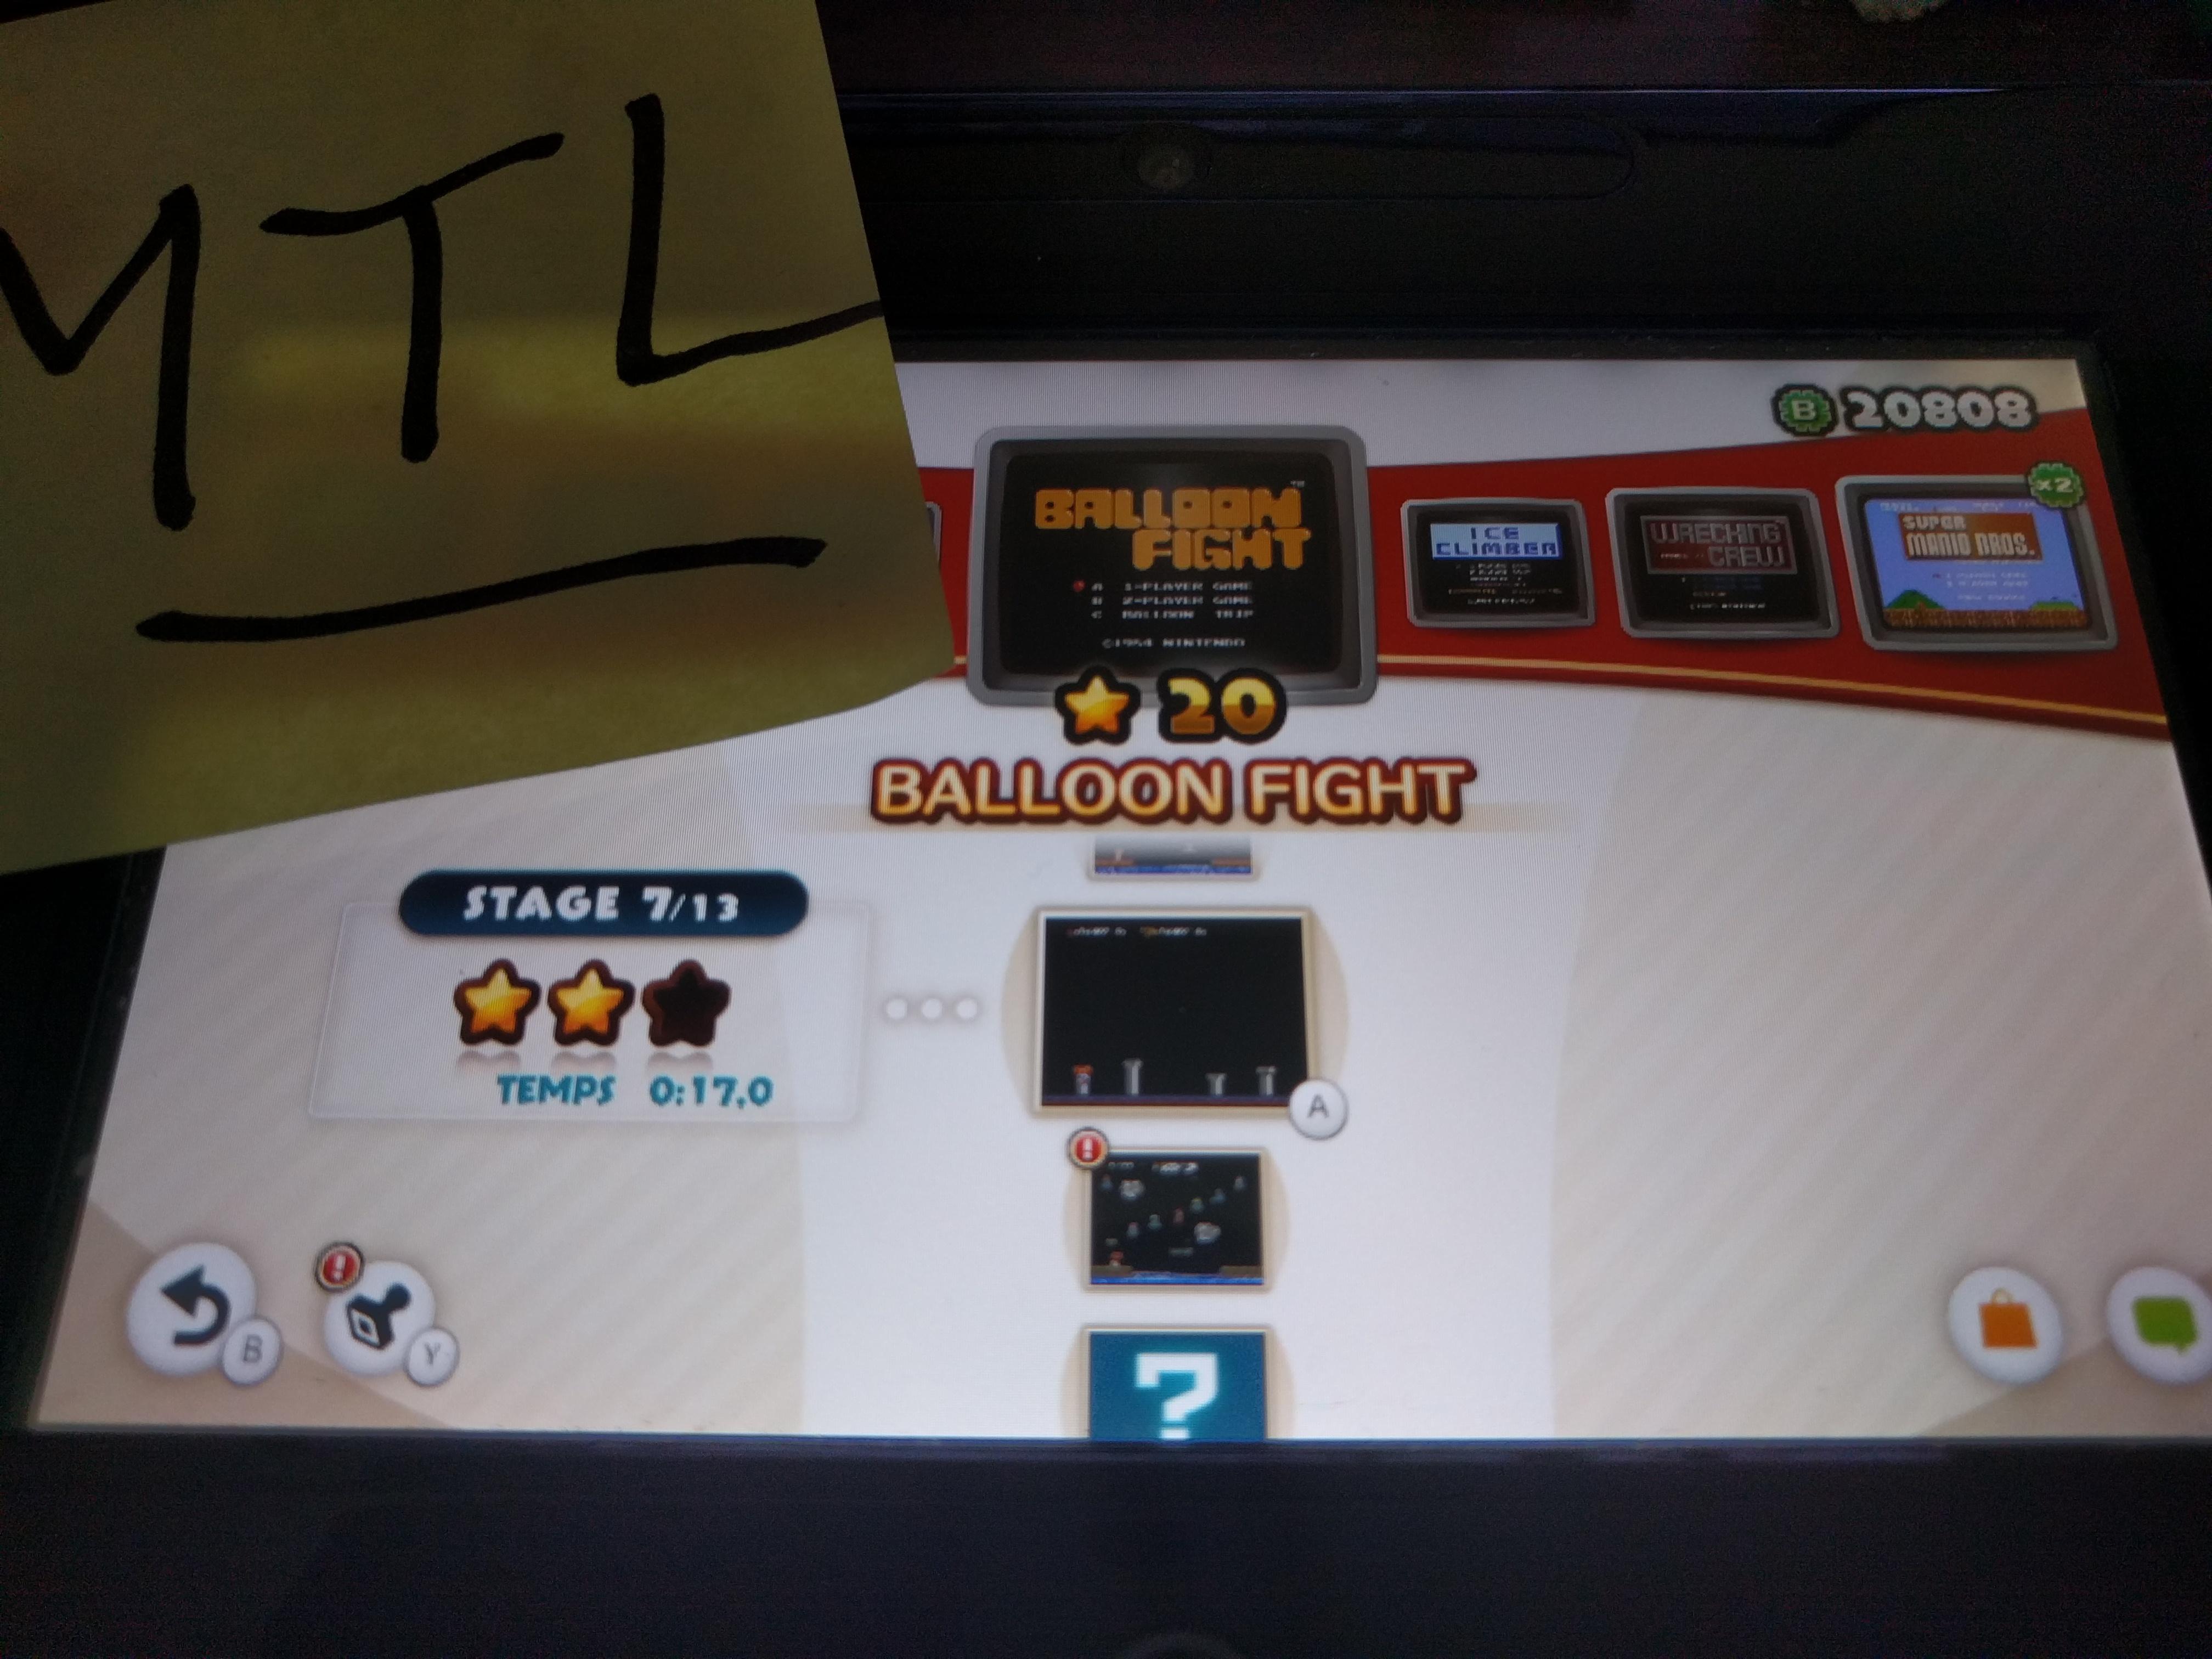 Mantalow: NES Remix: Balloon Fight: Stage 7 (Wii U) 0:00:17 points on 2016-06-08 02:33:56